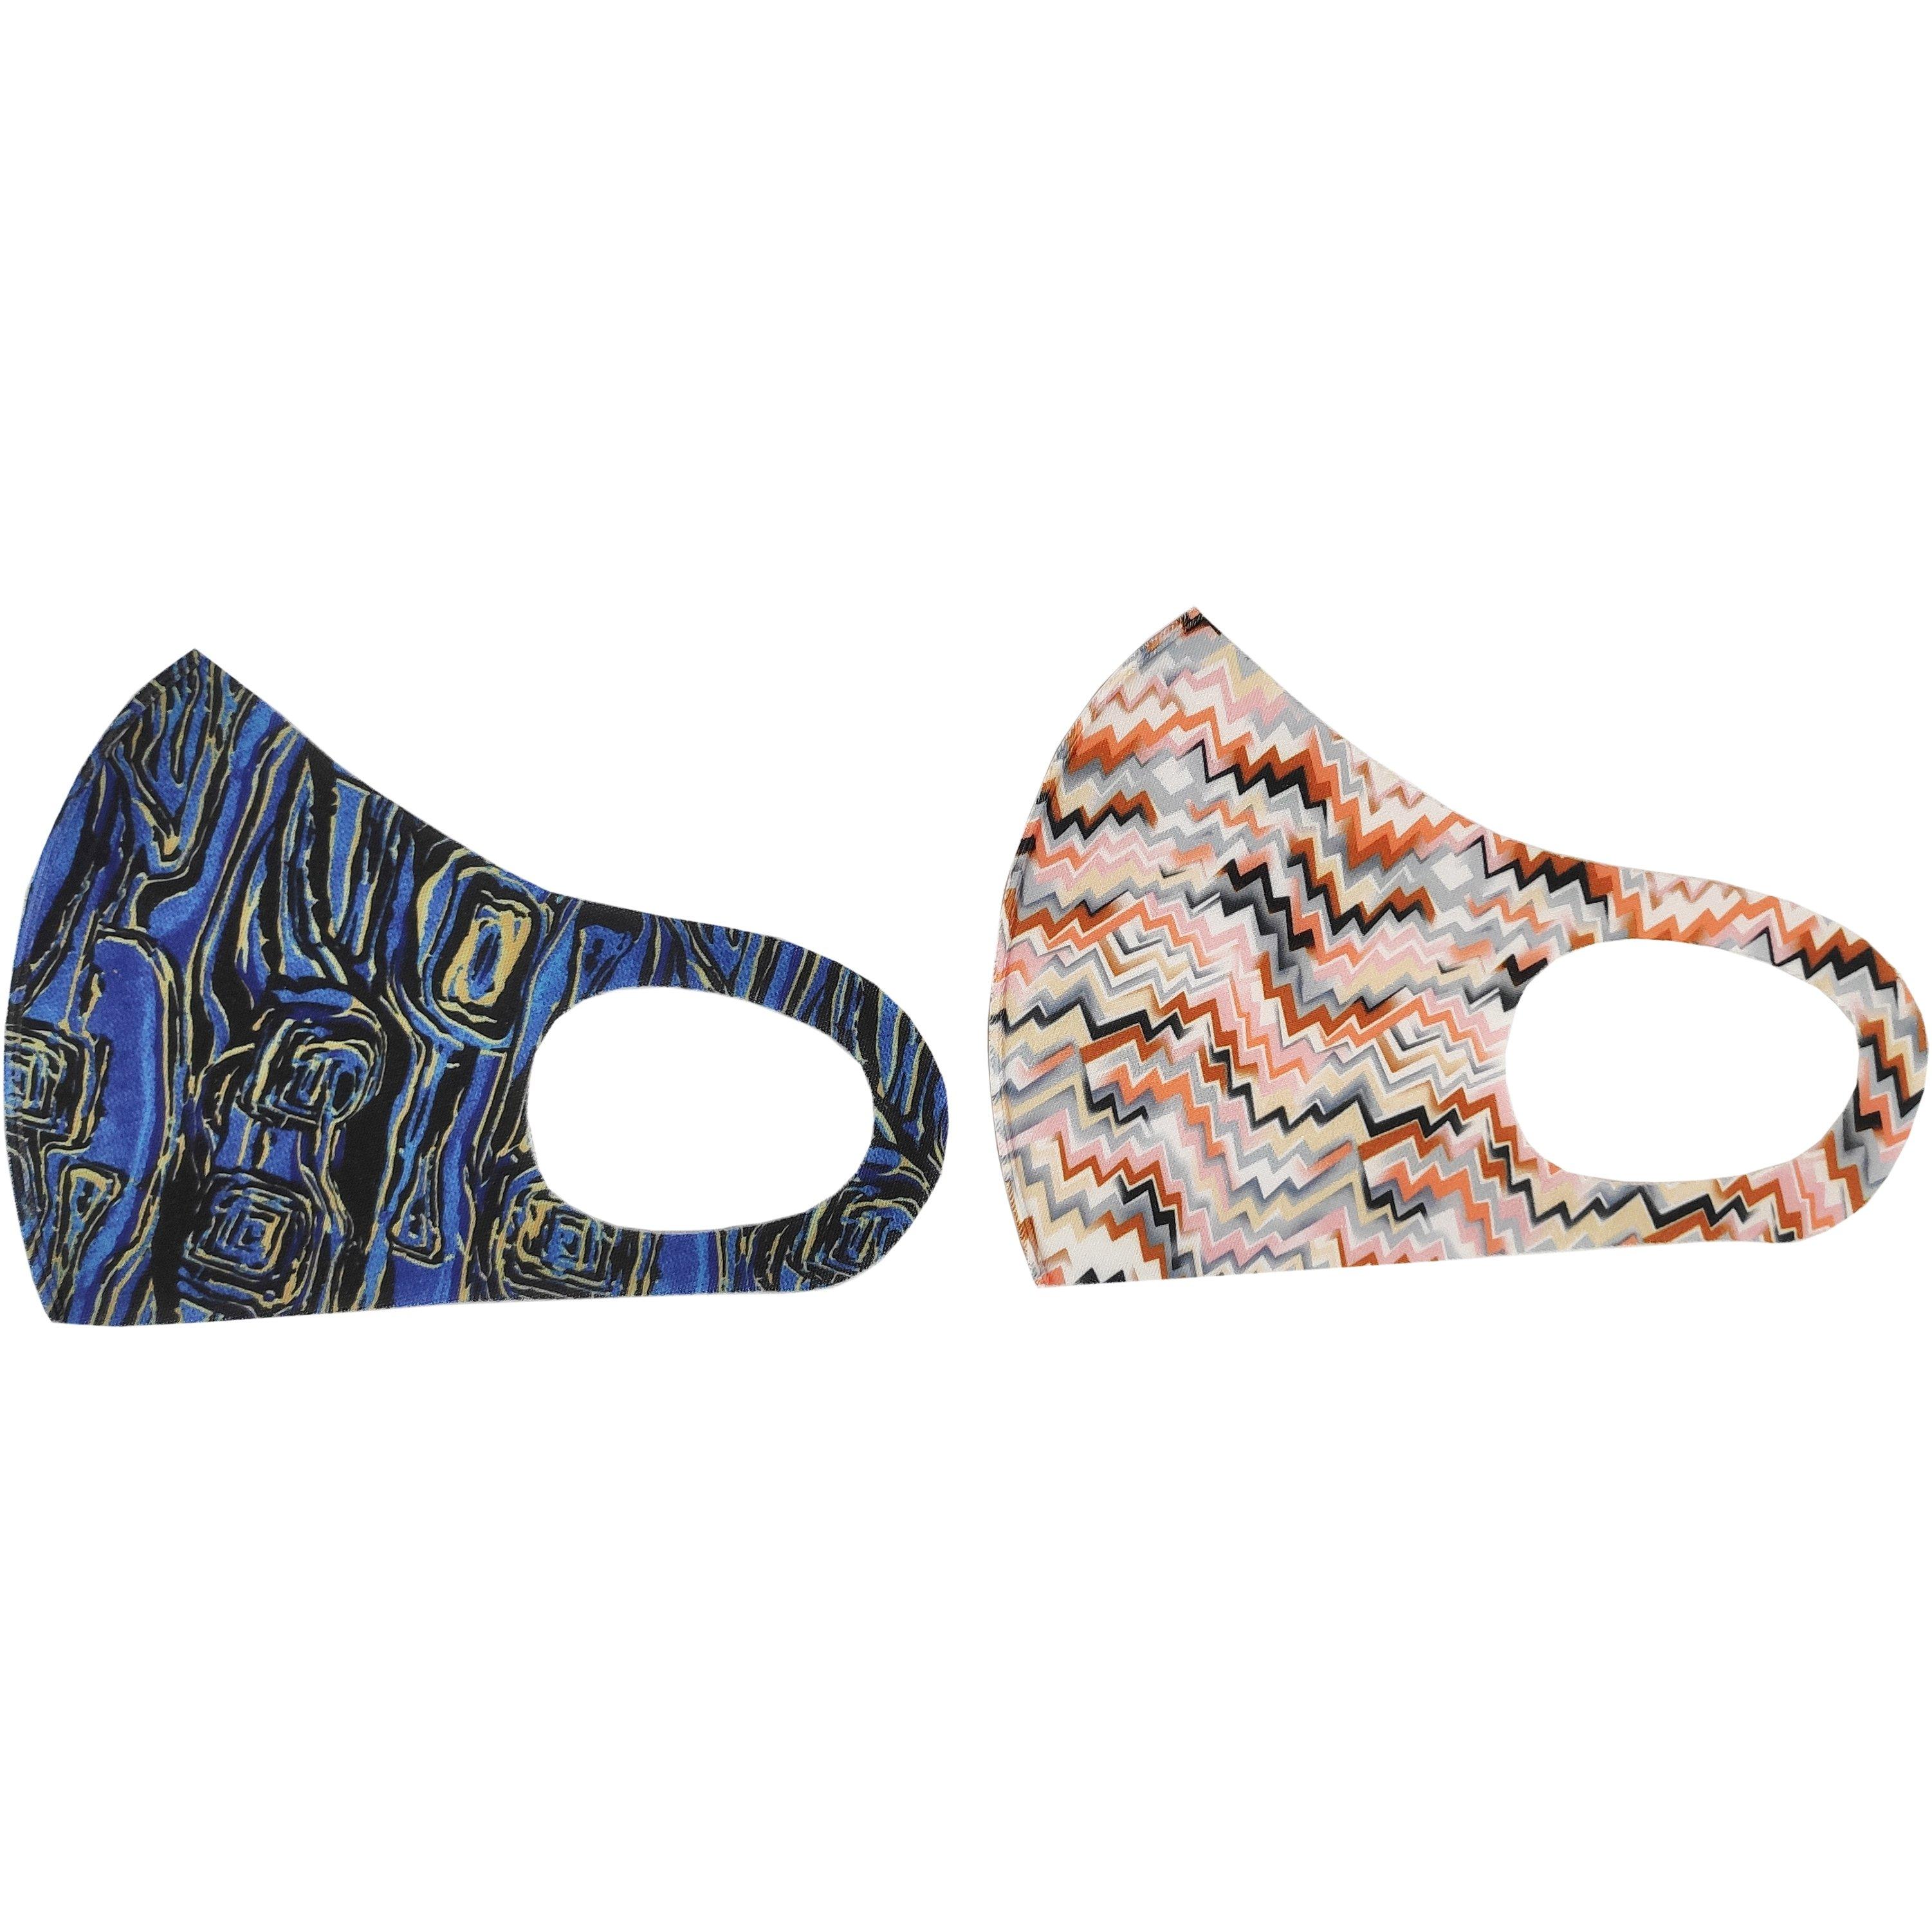 TiLi Fashion Face Mask Μάσκα Ενηλίκων Πολλαπλών Χρήσεων Μπλε – Ροζ Εμπριμέ Σχέδιο 2 Τεμάχια